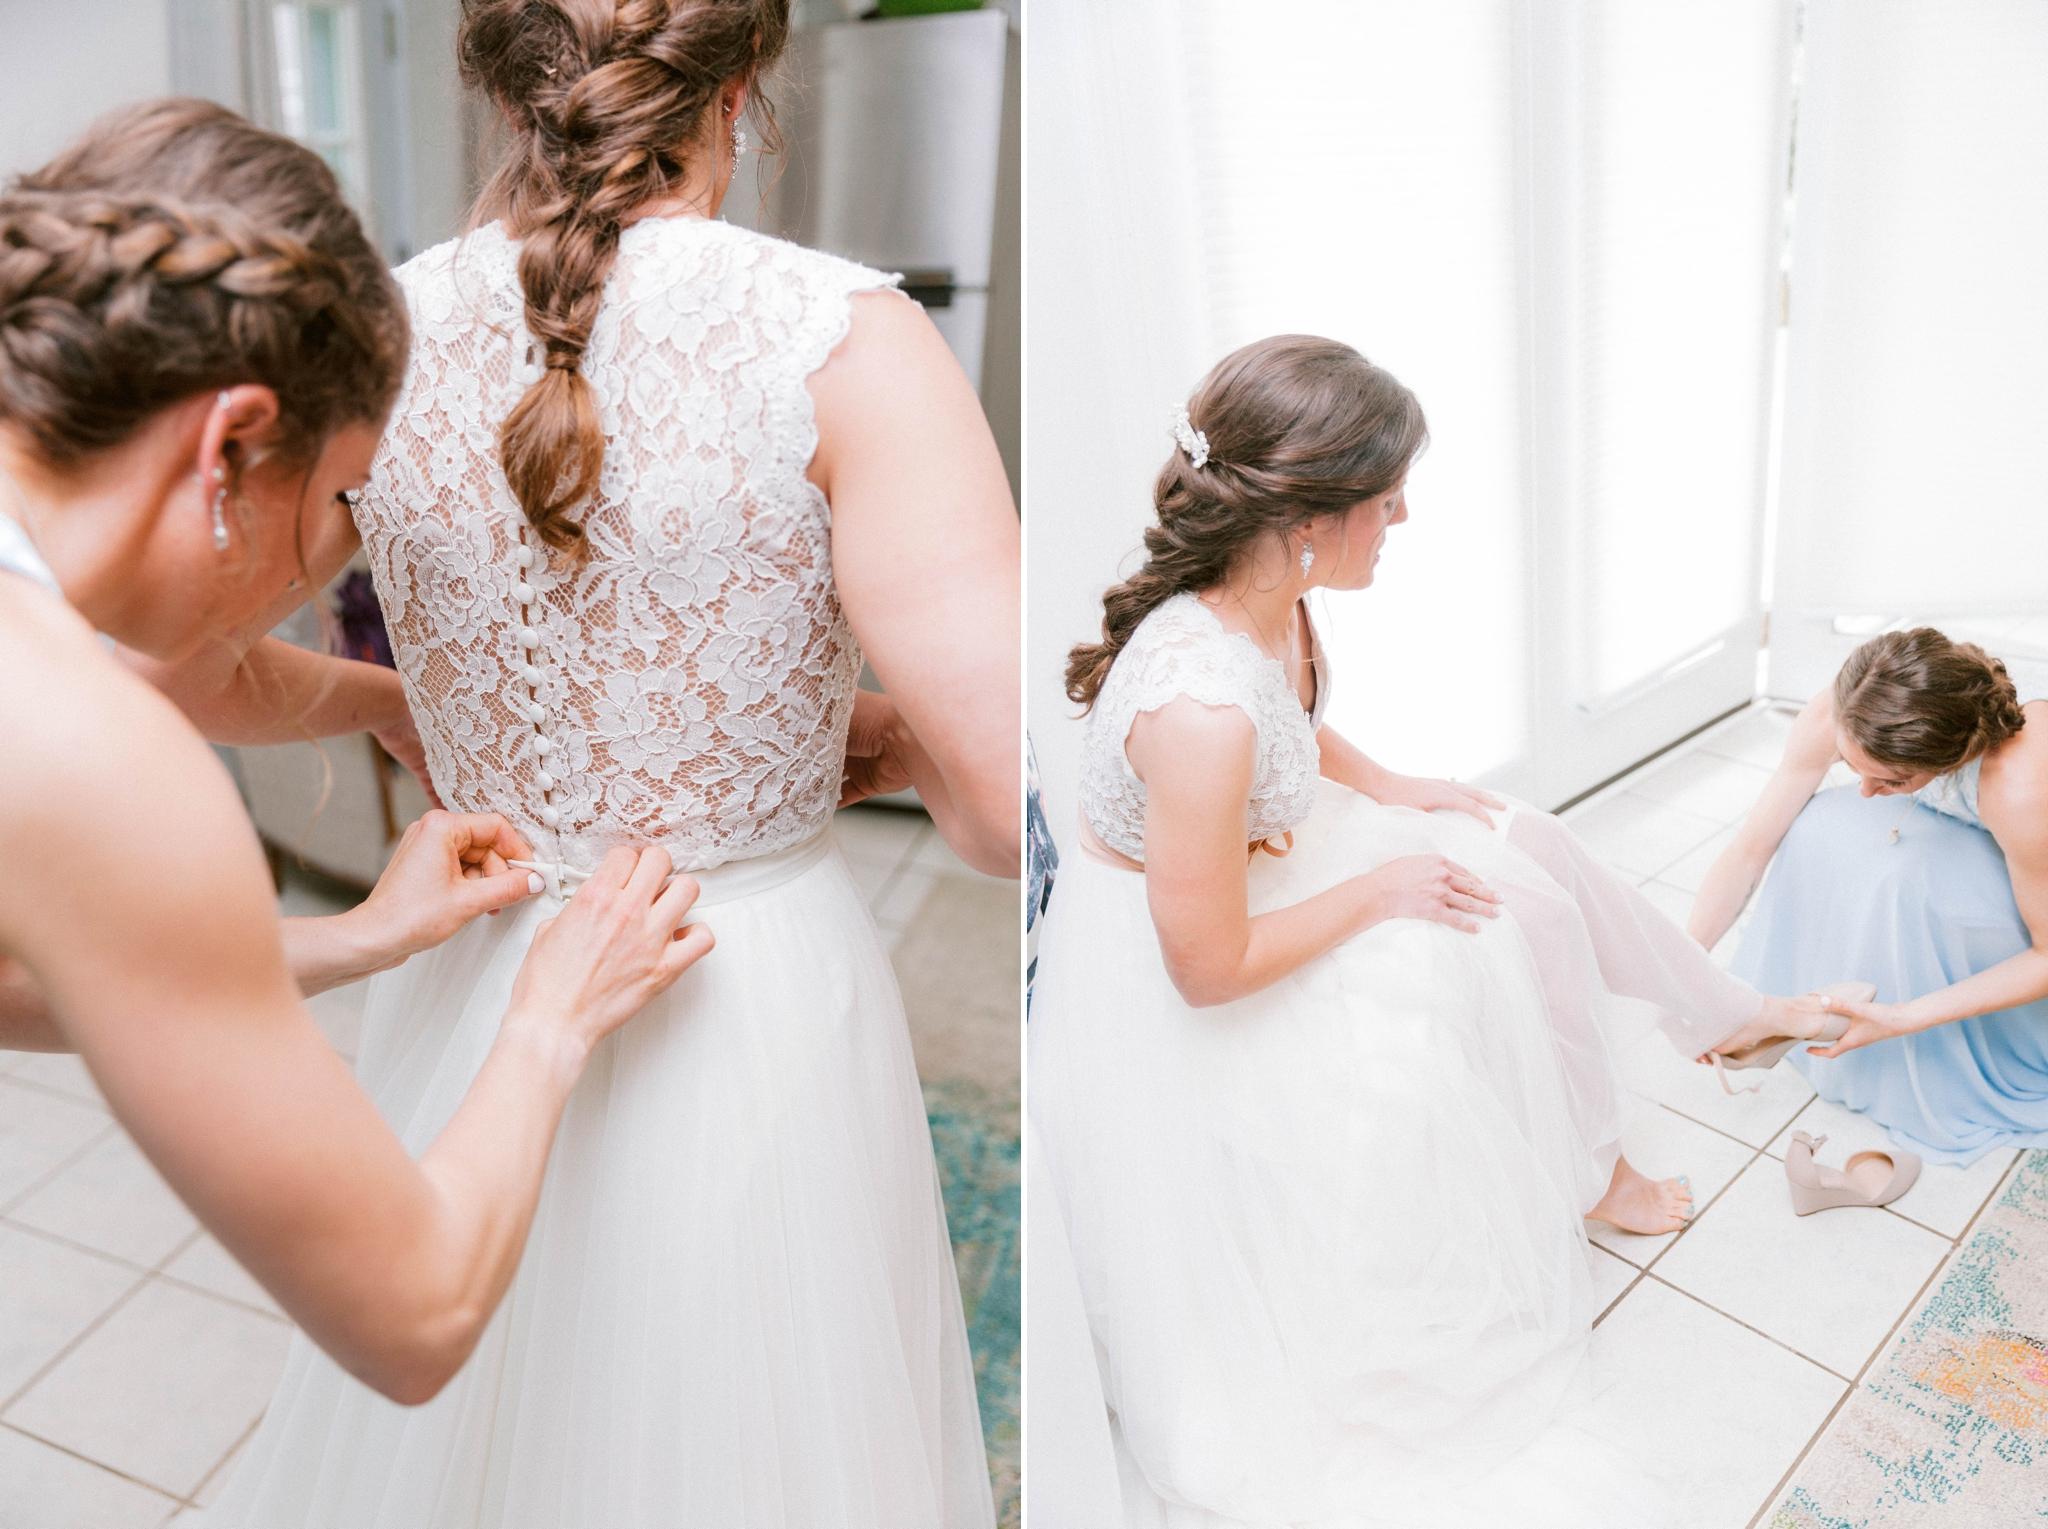 bride getting into her dress and shoes - Honolulu Oahu Hawaii Wedding Photographer